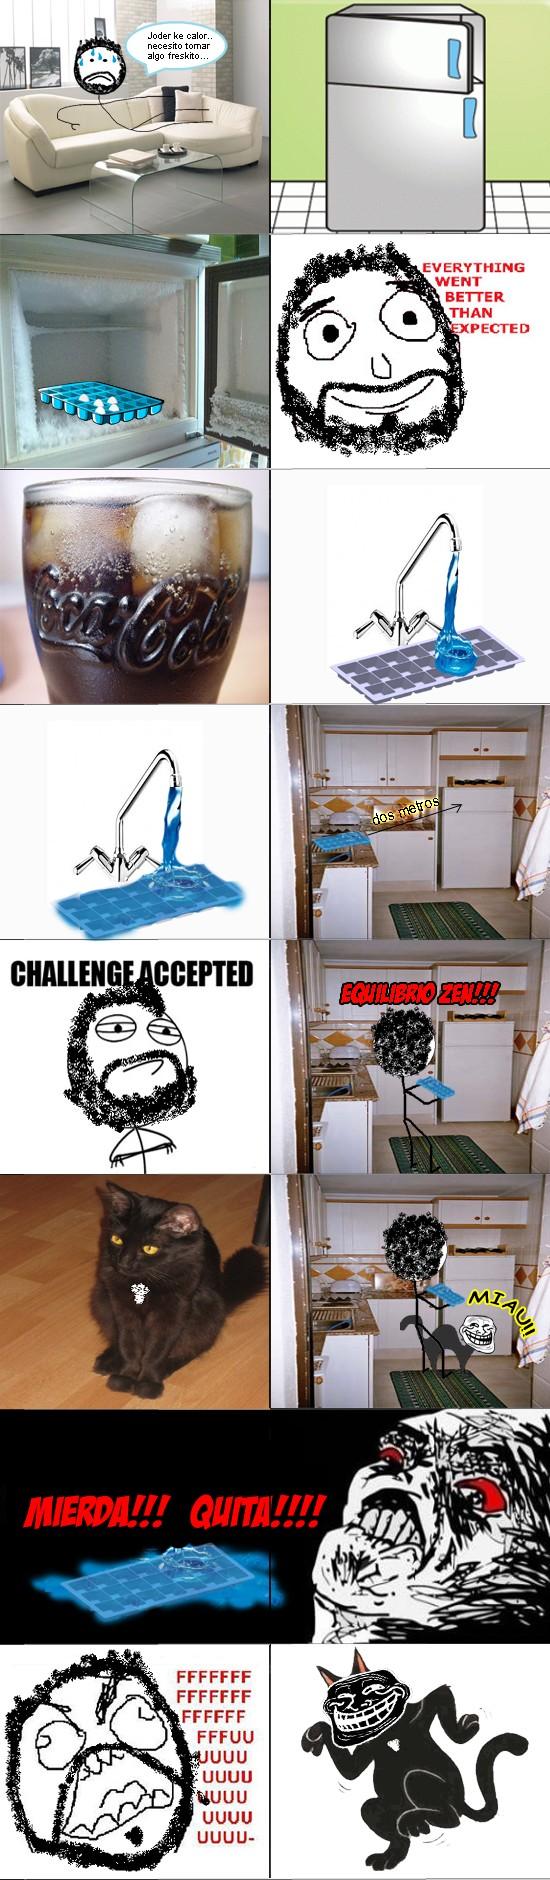 Challenge Accepted,cubitera,FFUU,gato,hielo,troll